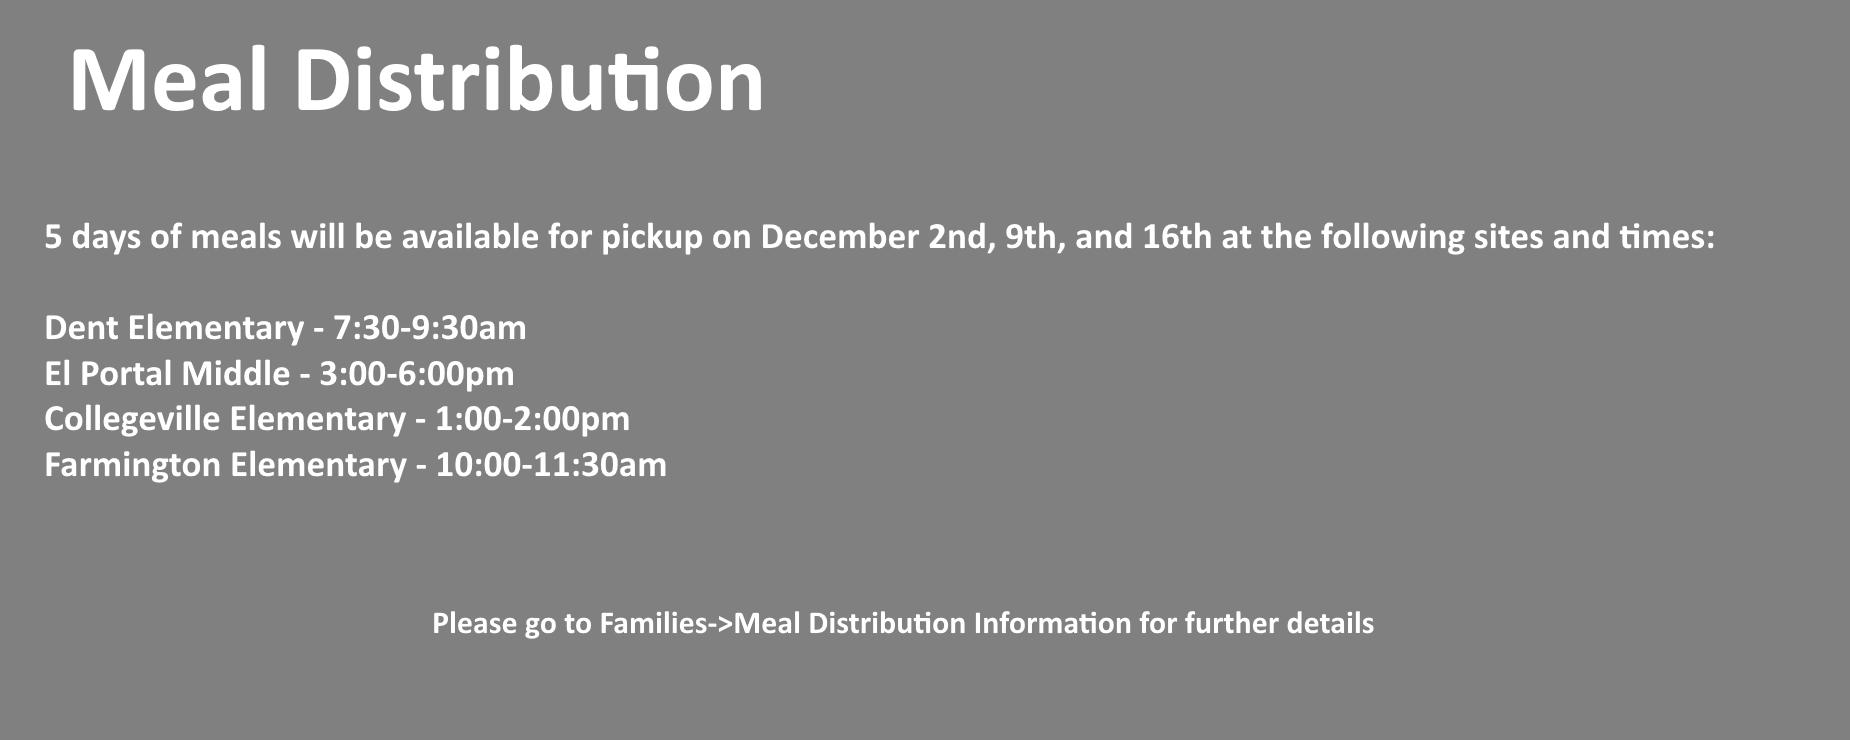 Meal Distribution Information